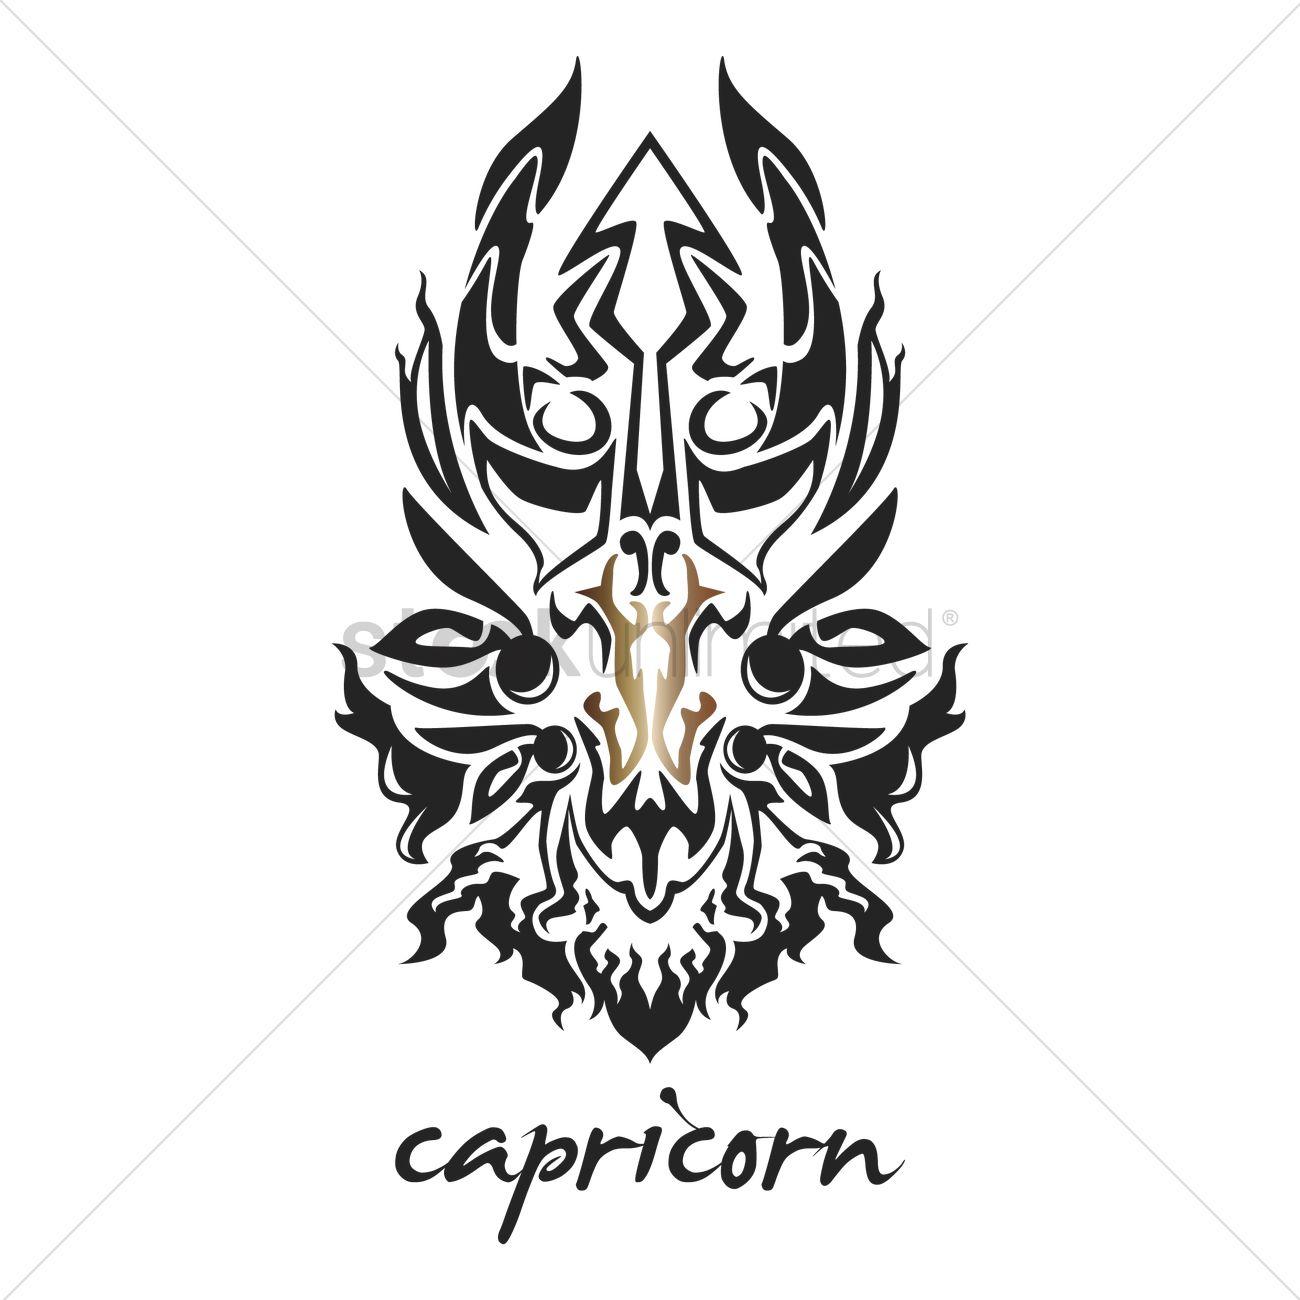 capricorn tattoo horoscope design vector image 1969171